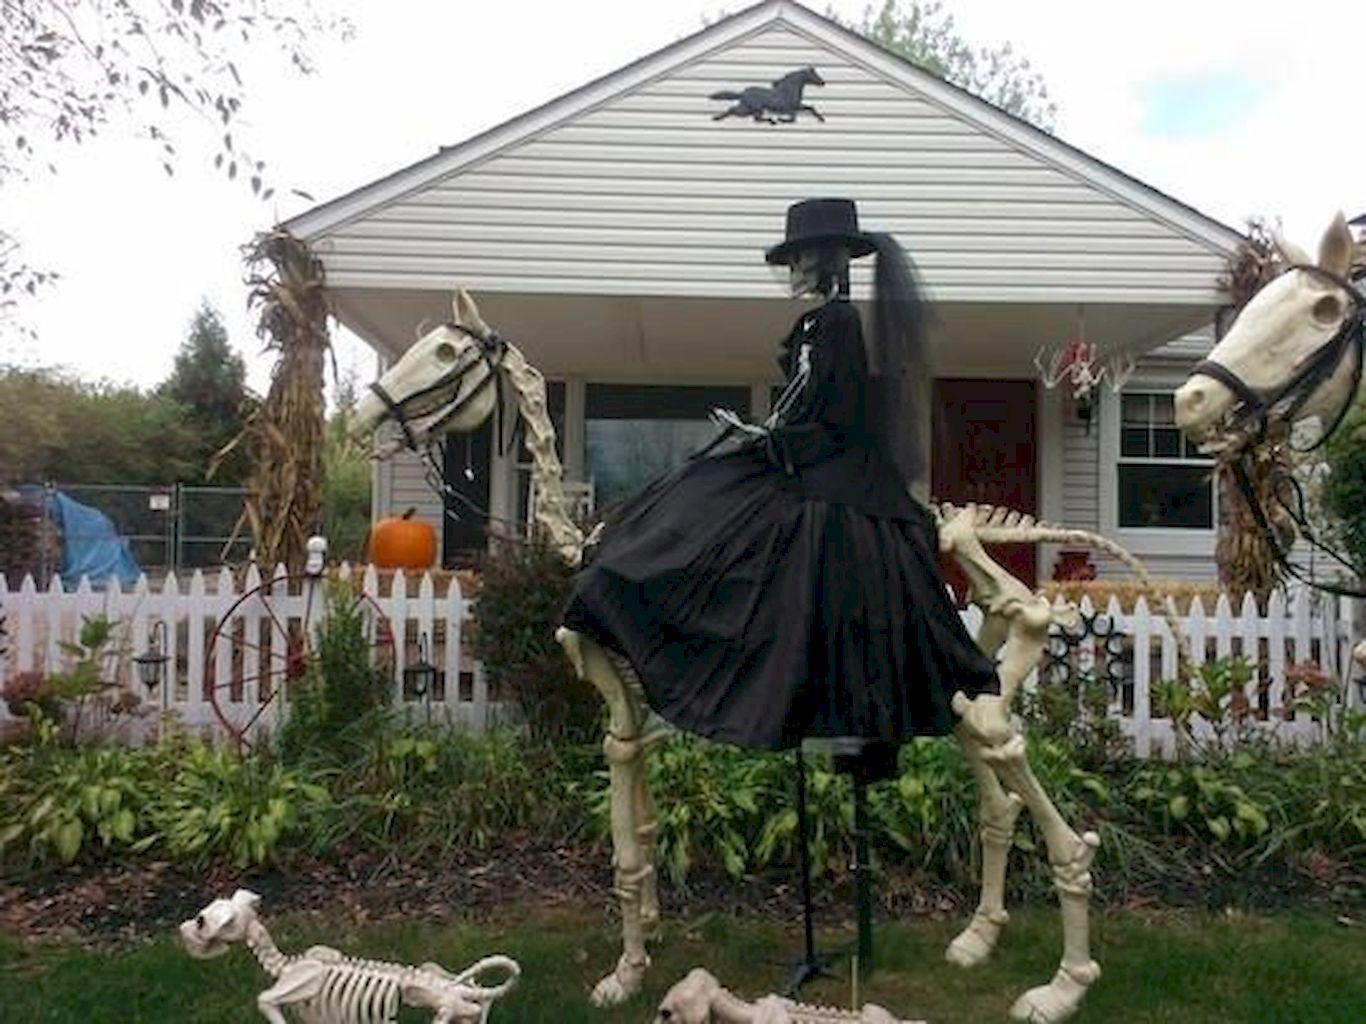 80 + CREEPY OUTDOOR HALLOWEEN DECORATION IDEAS Gardening - front yard halloween decorations